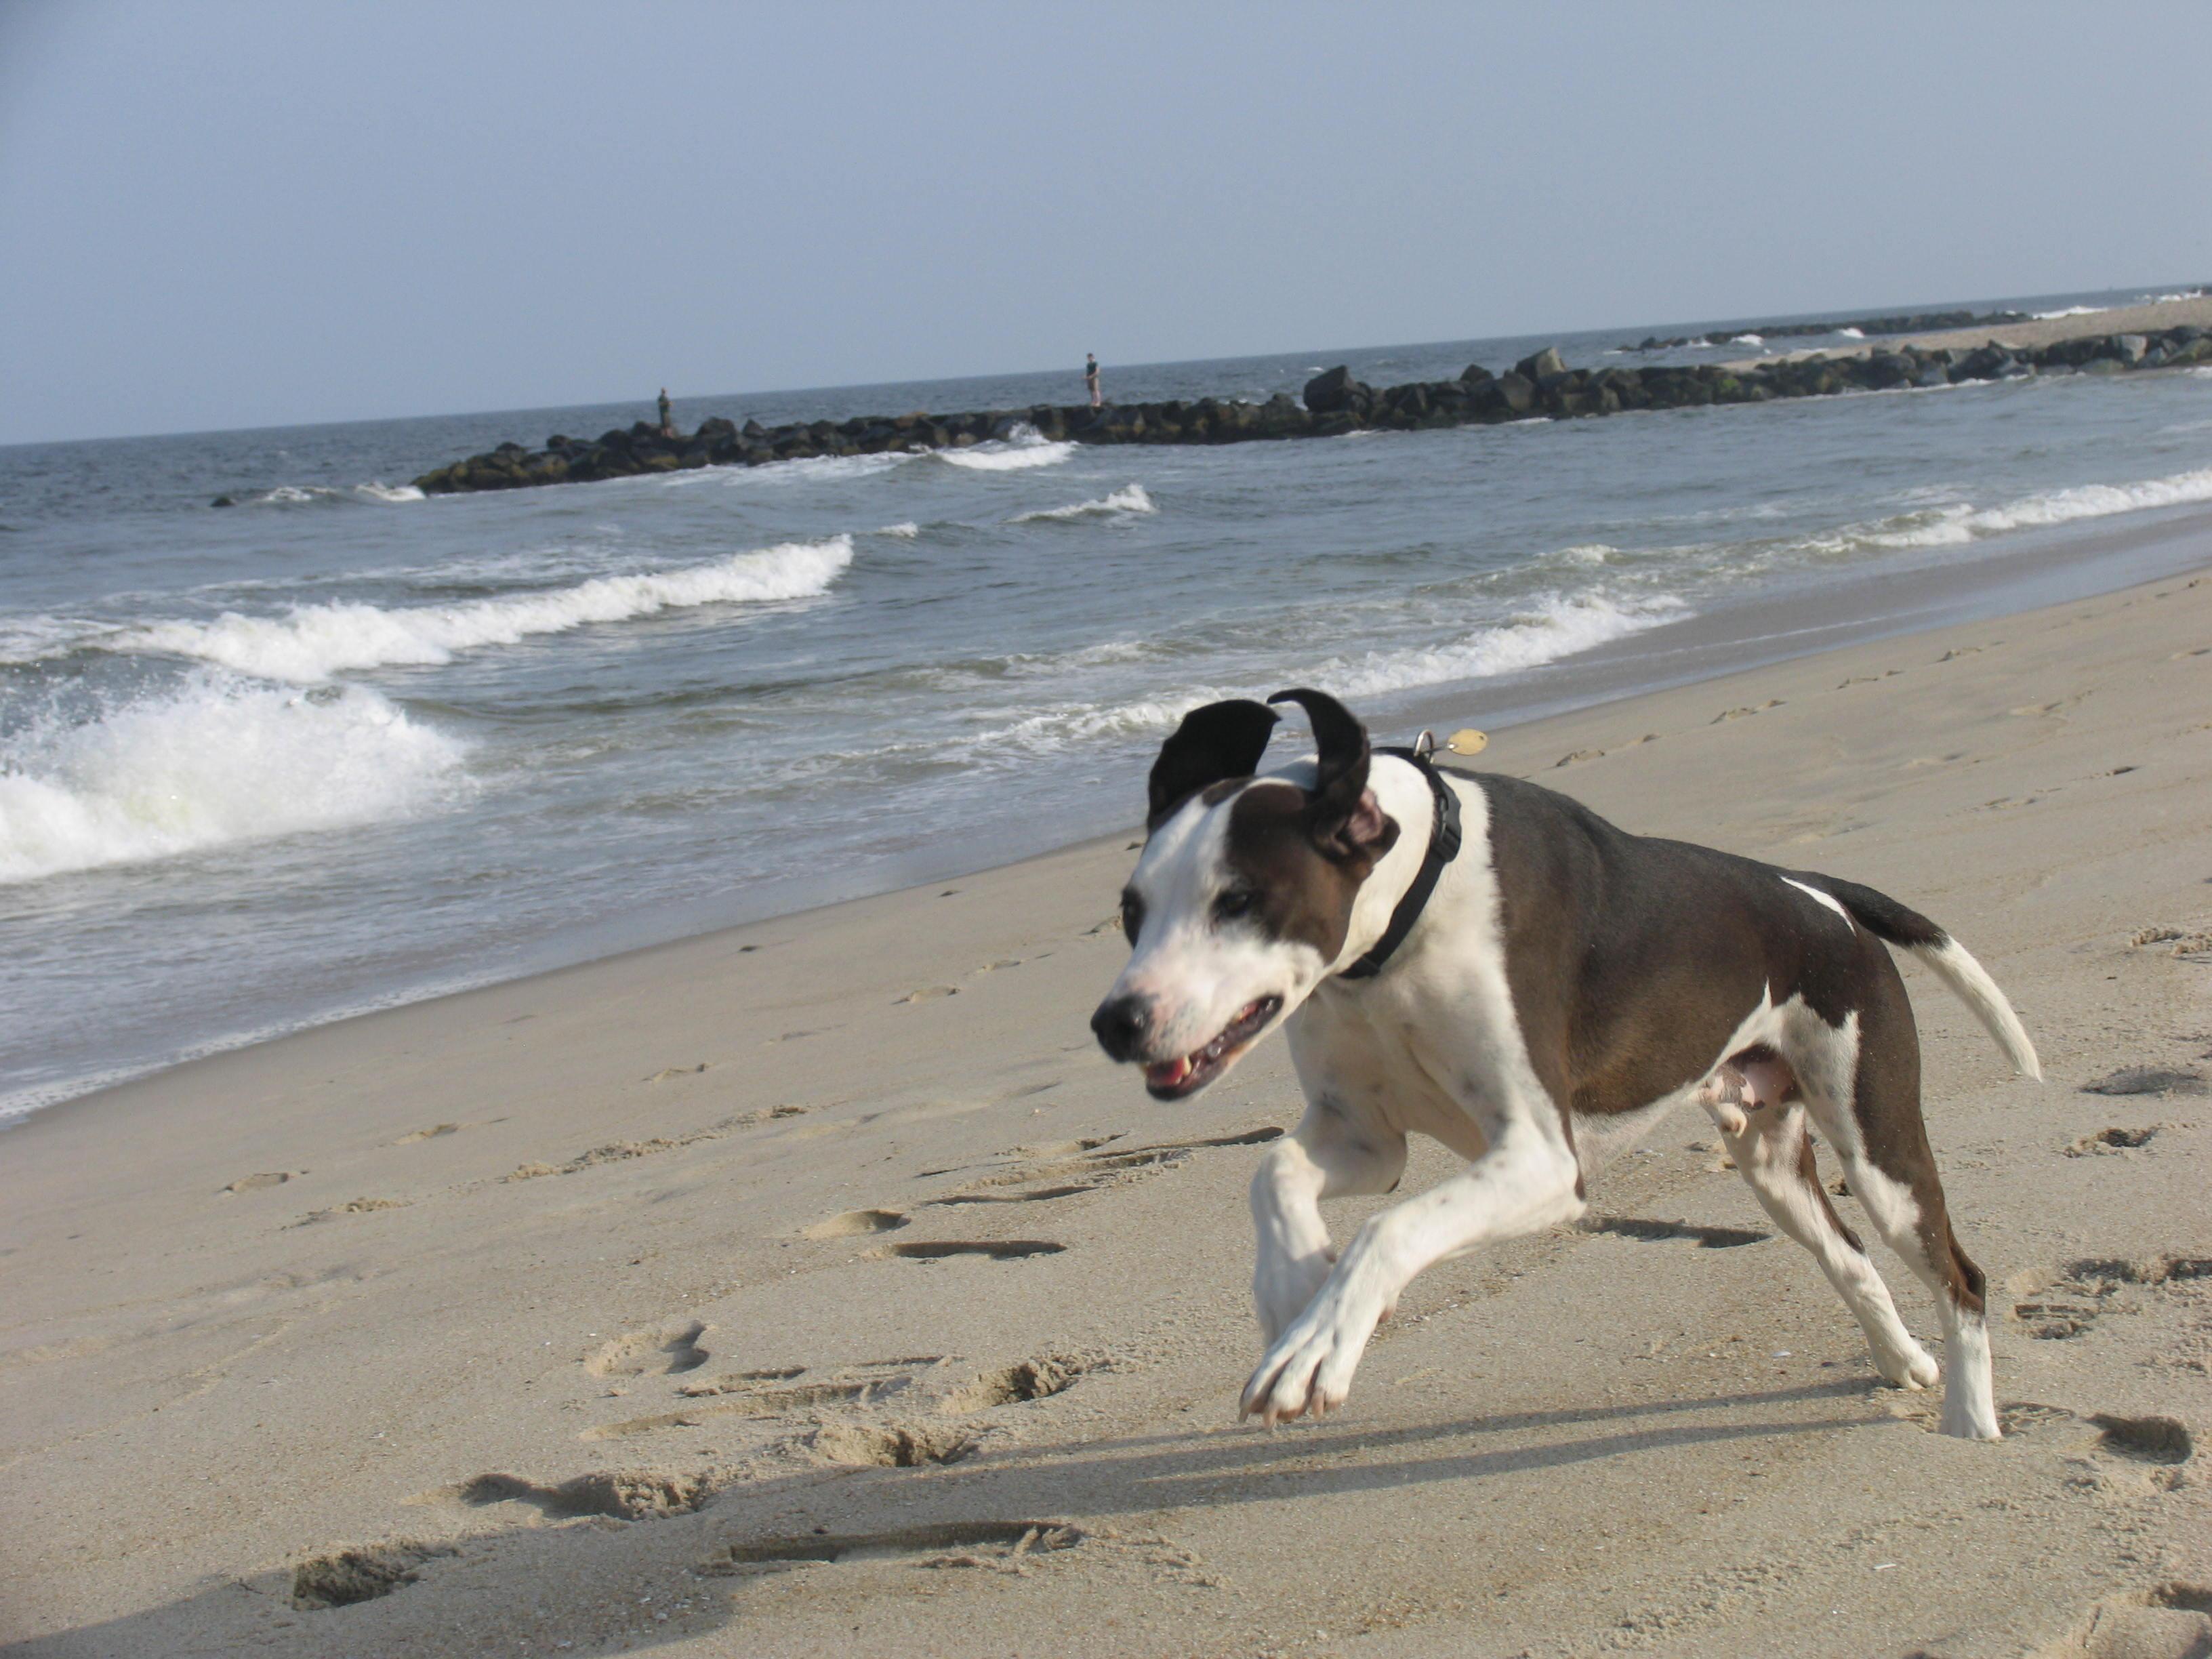 Henry misses the beach